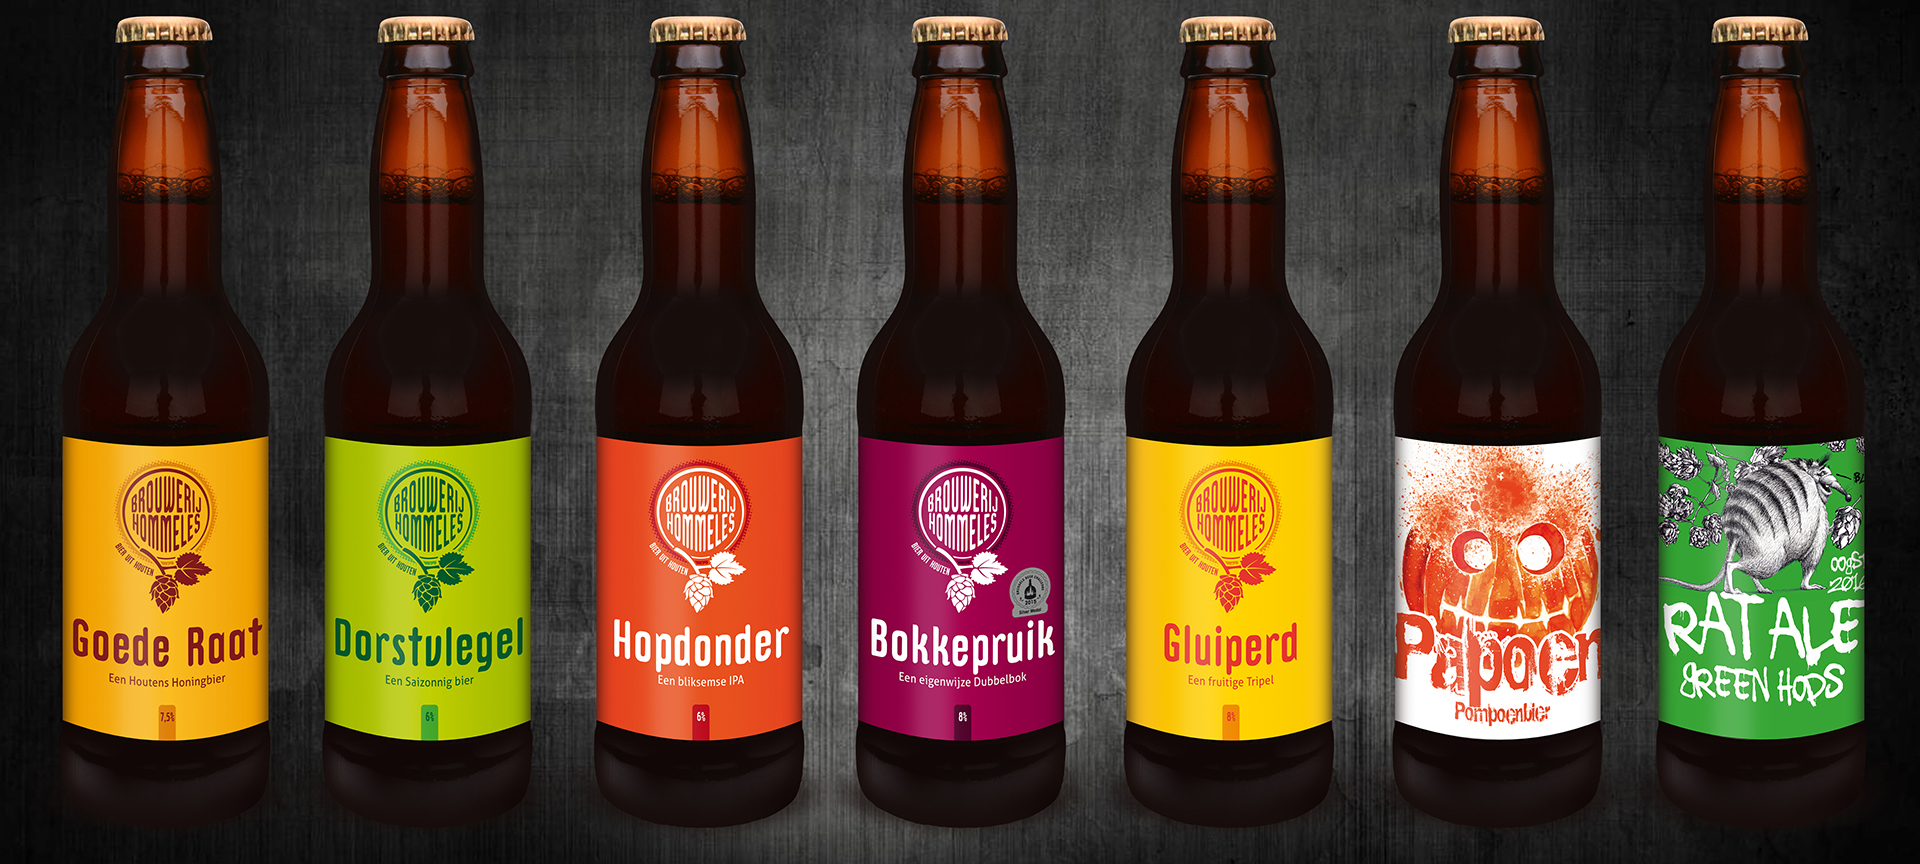 nectar-pils-bier-brouwerij-nederland-streekbier-houten-hommeles-foto-02